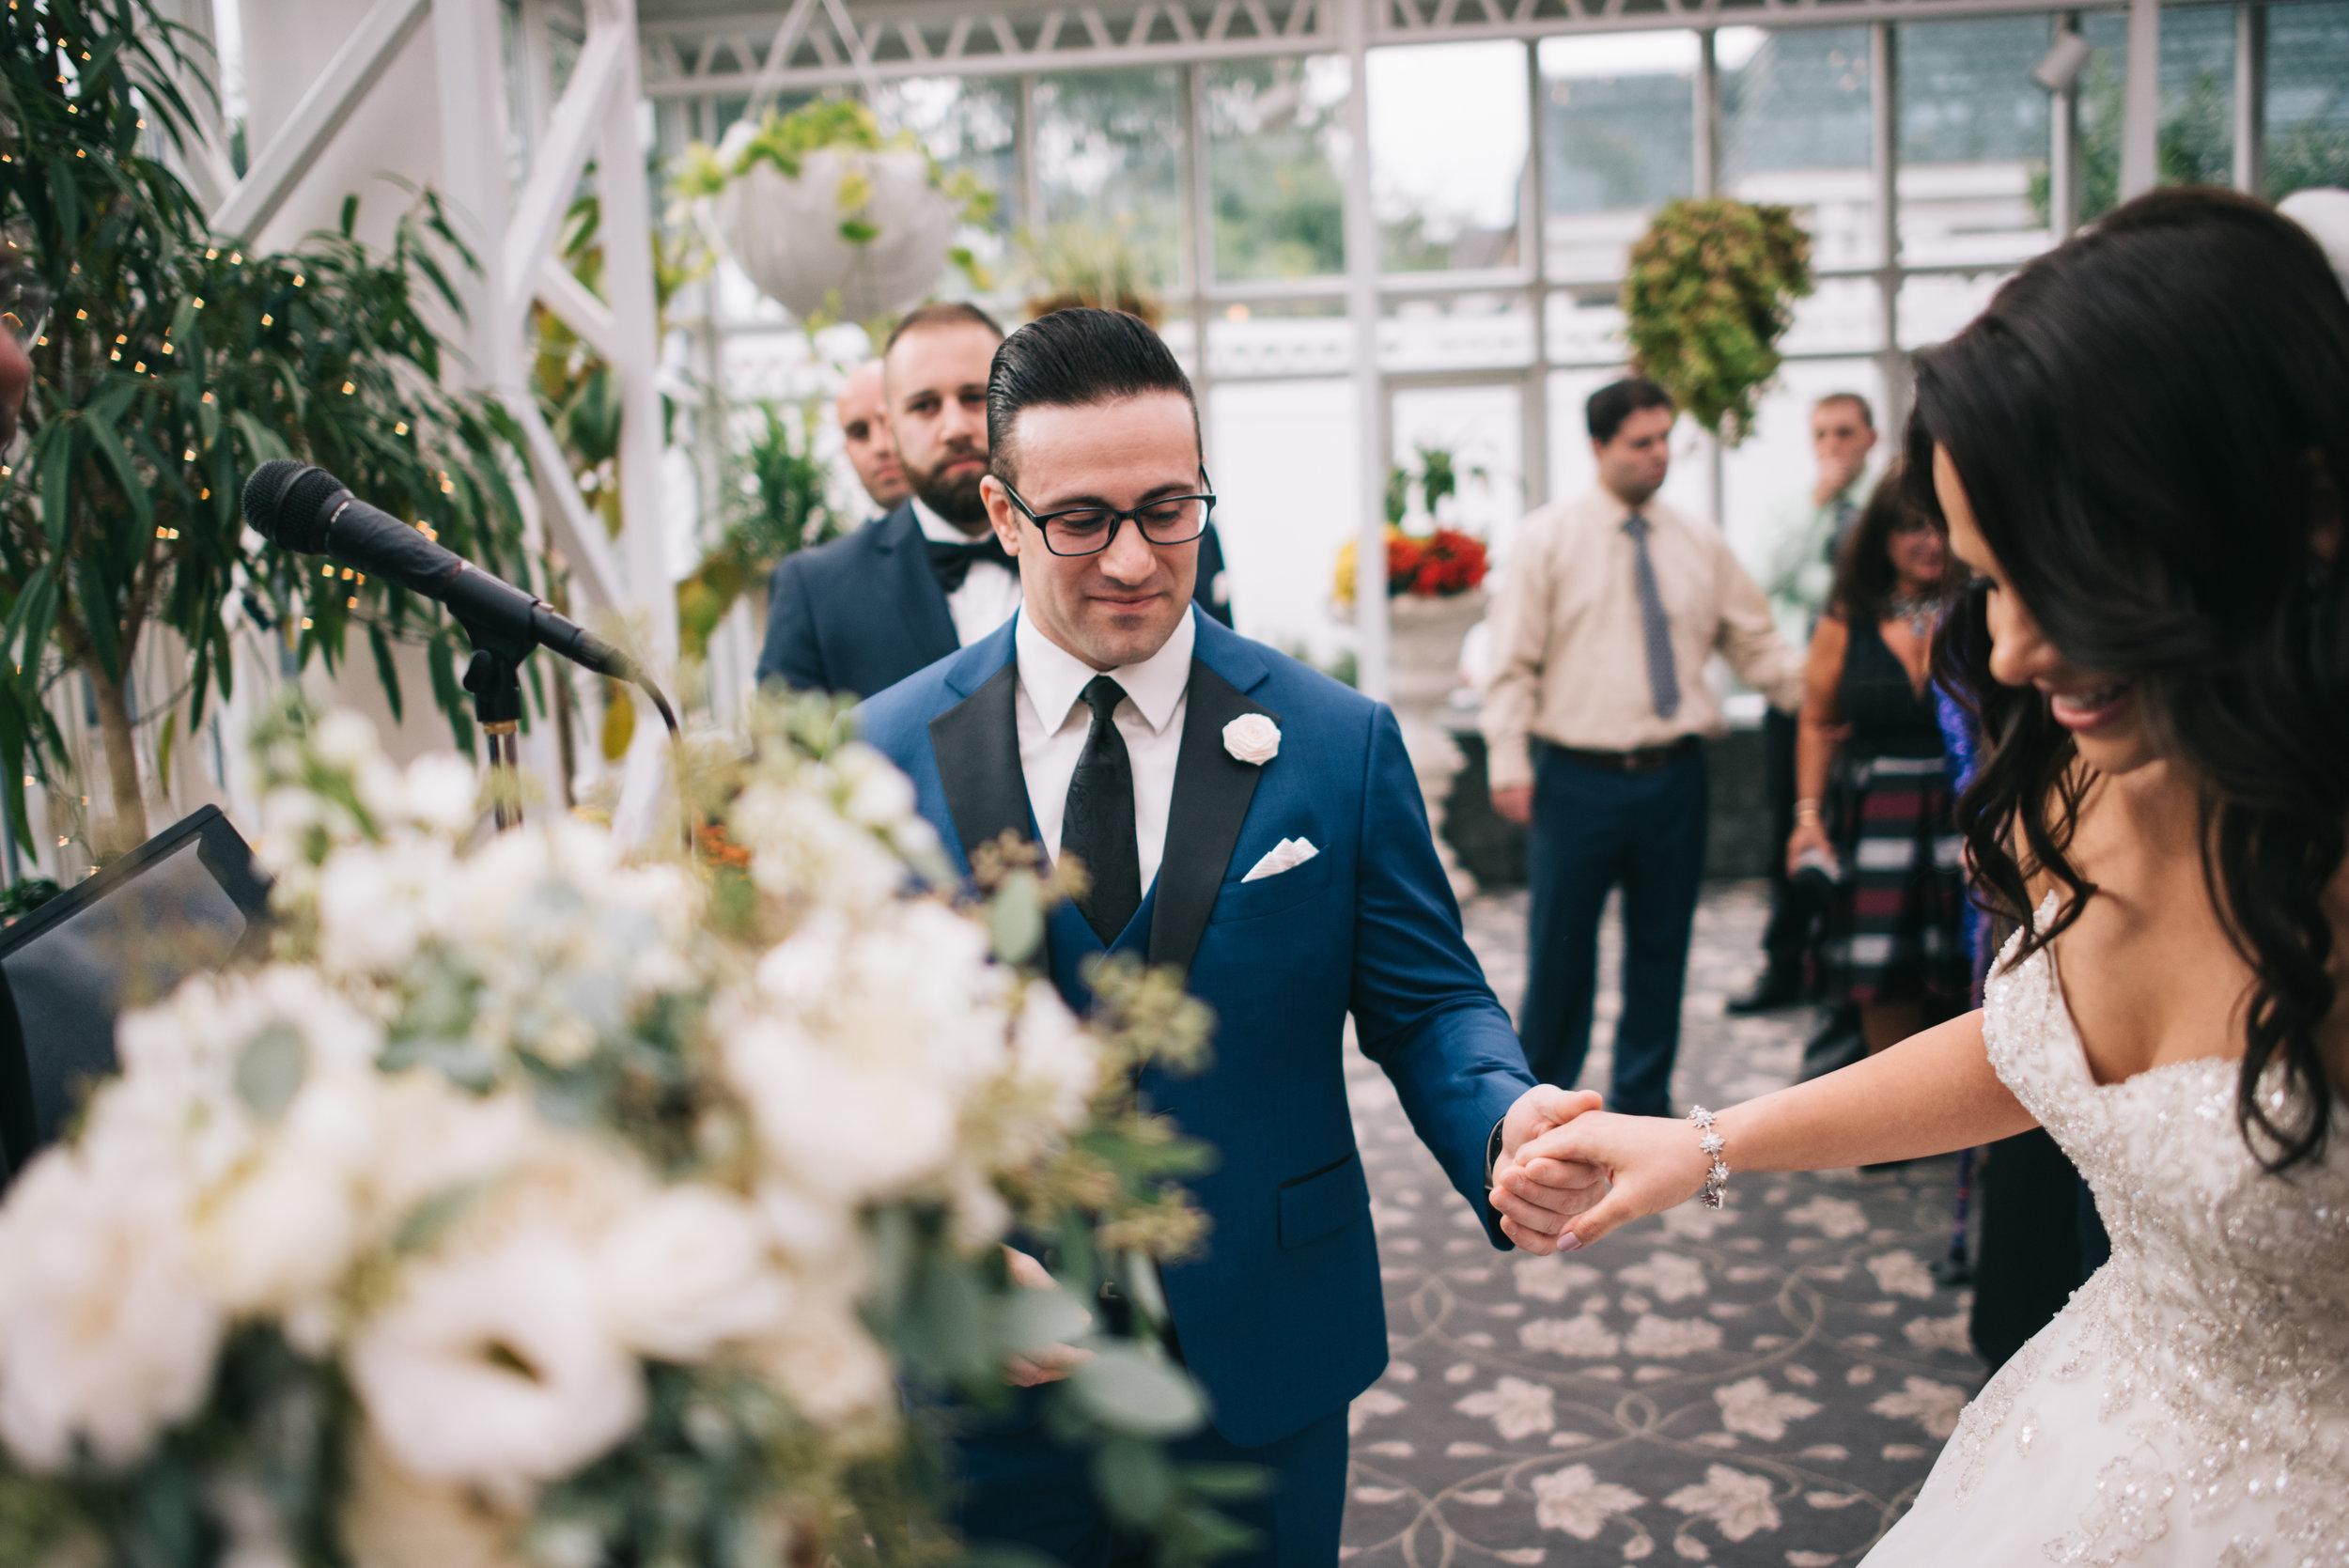 WeddingPhotos | NJPhotographer | Highlights-7-21.jpg